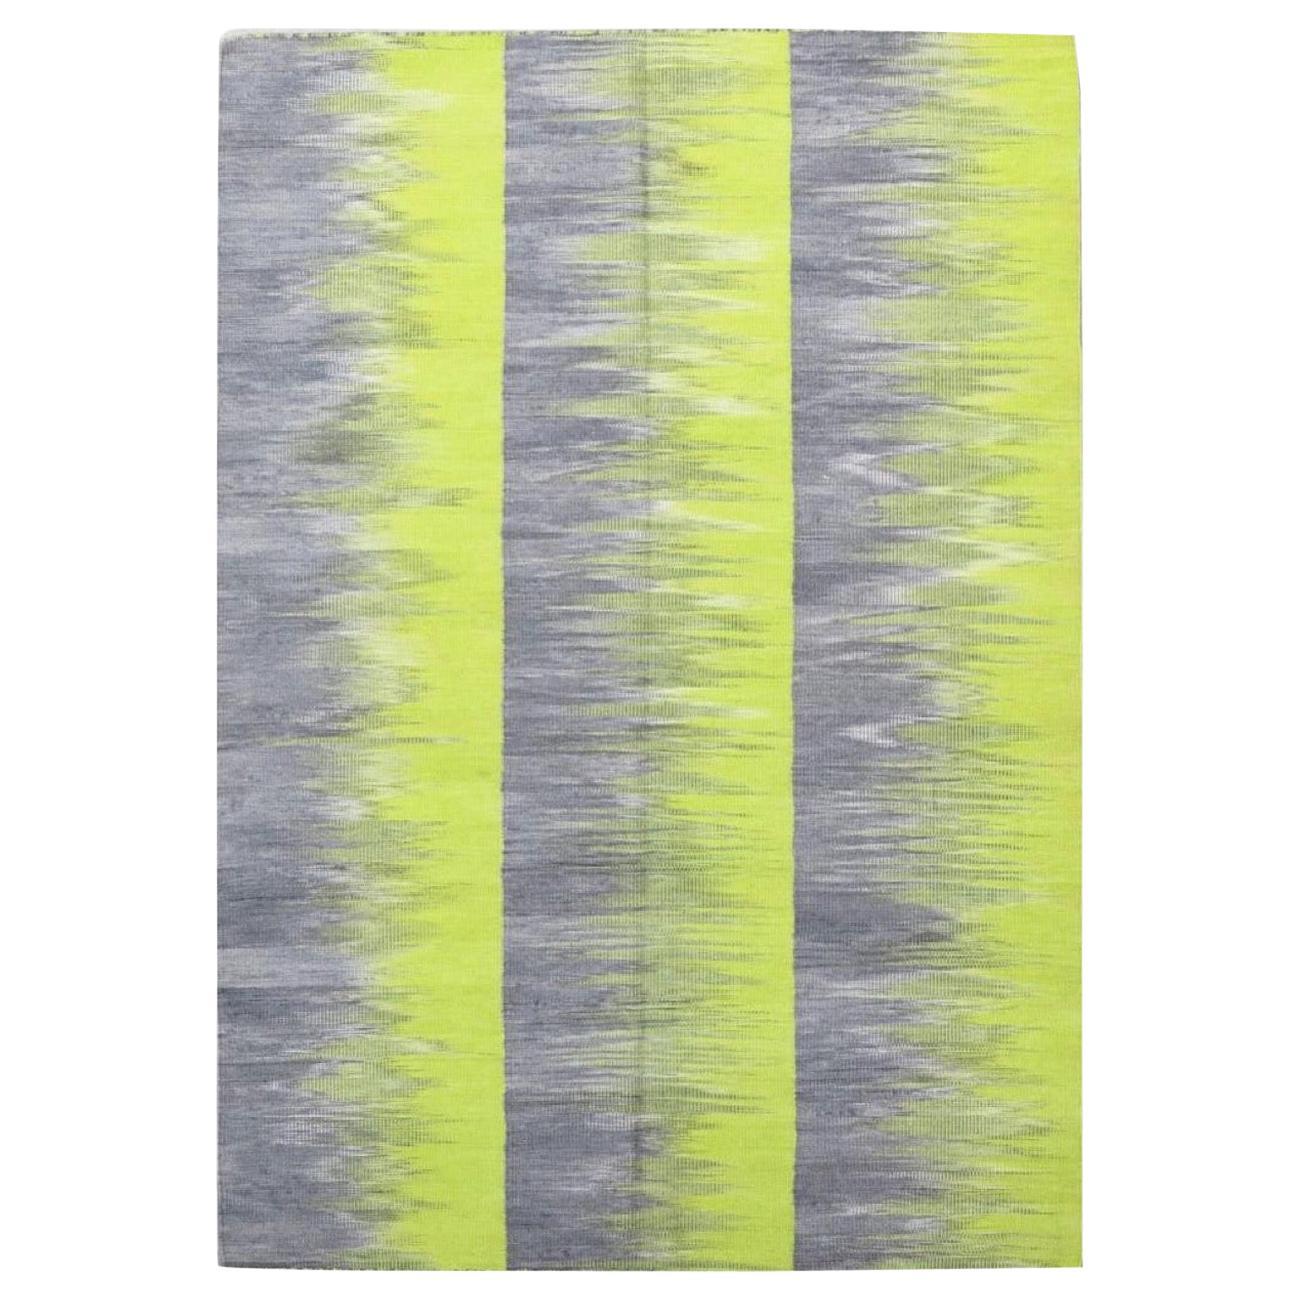 Beautiful New Modern Design Handwoven Kilim Rug